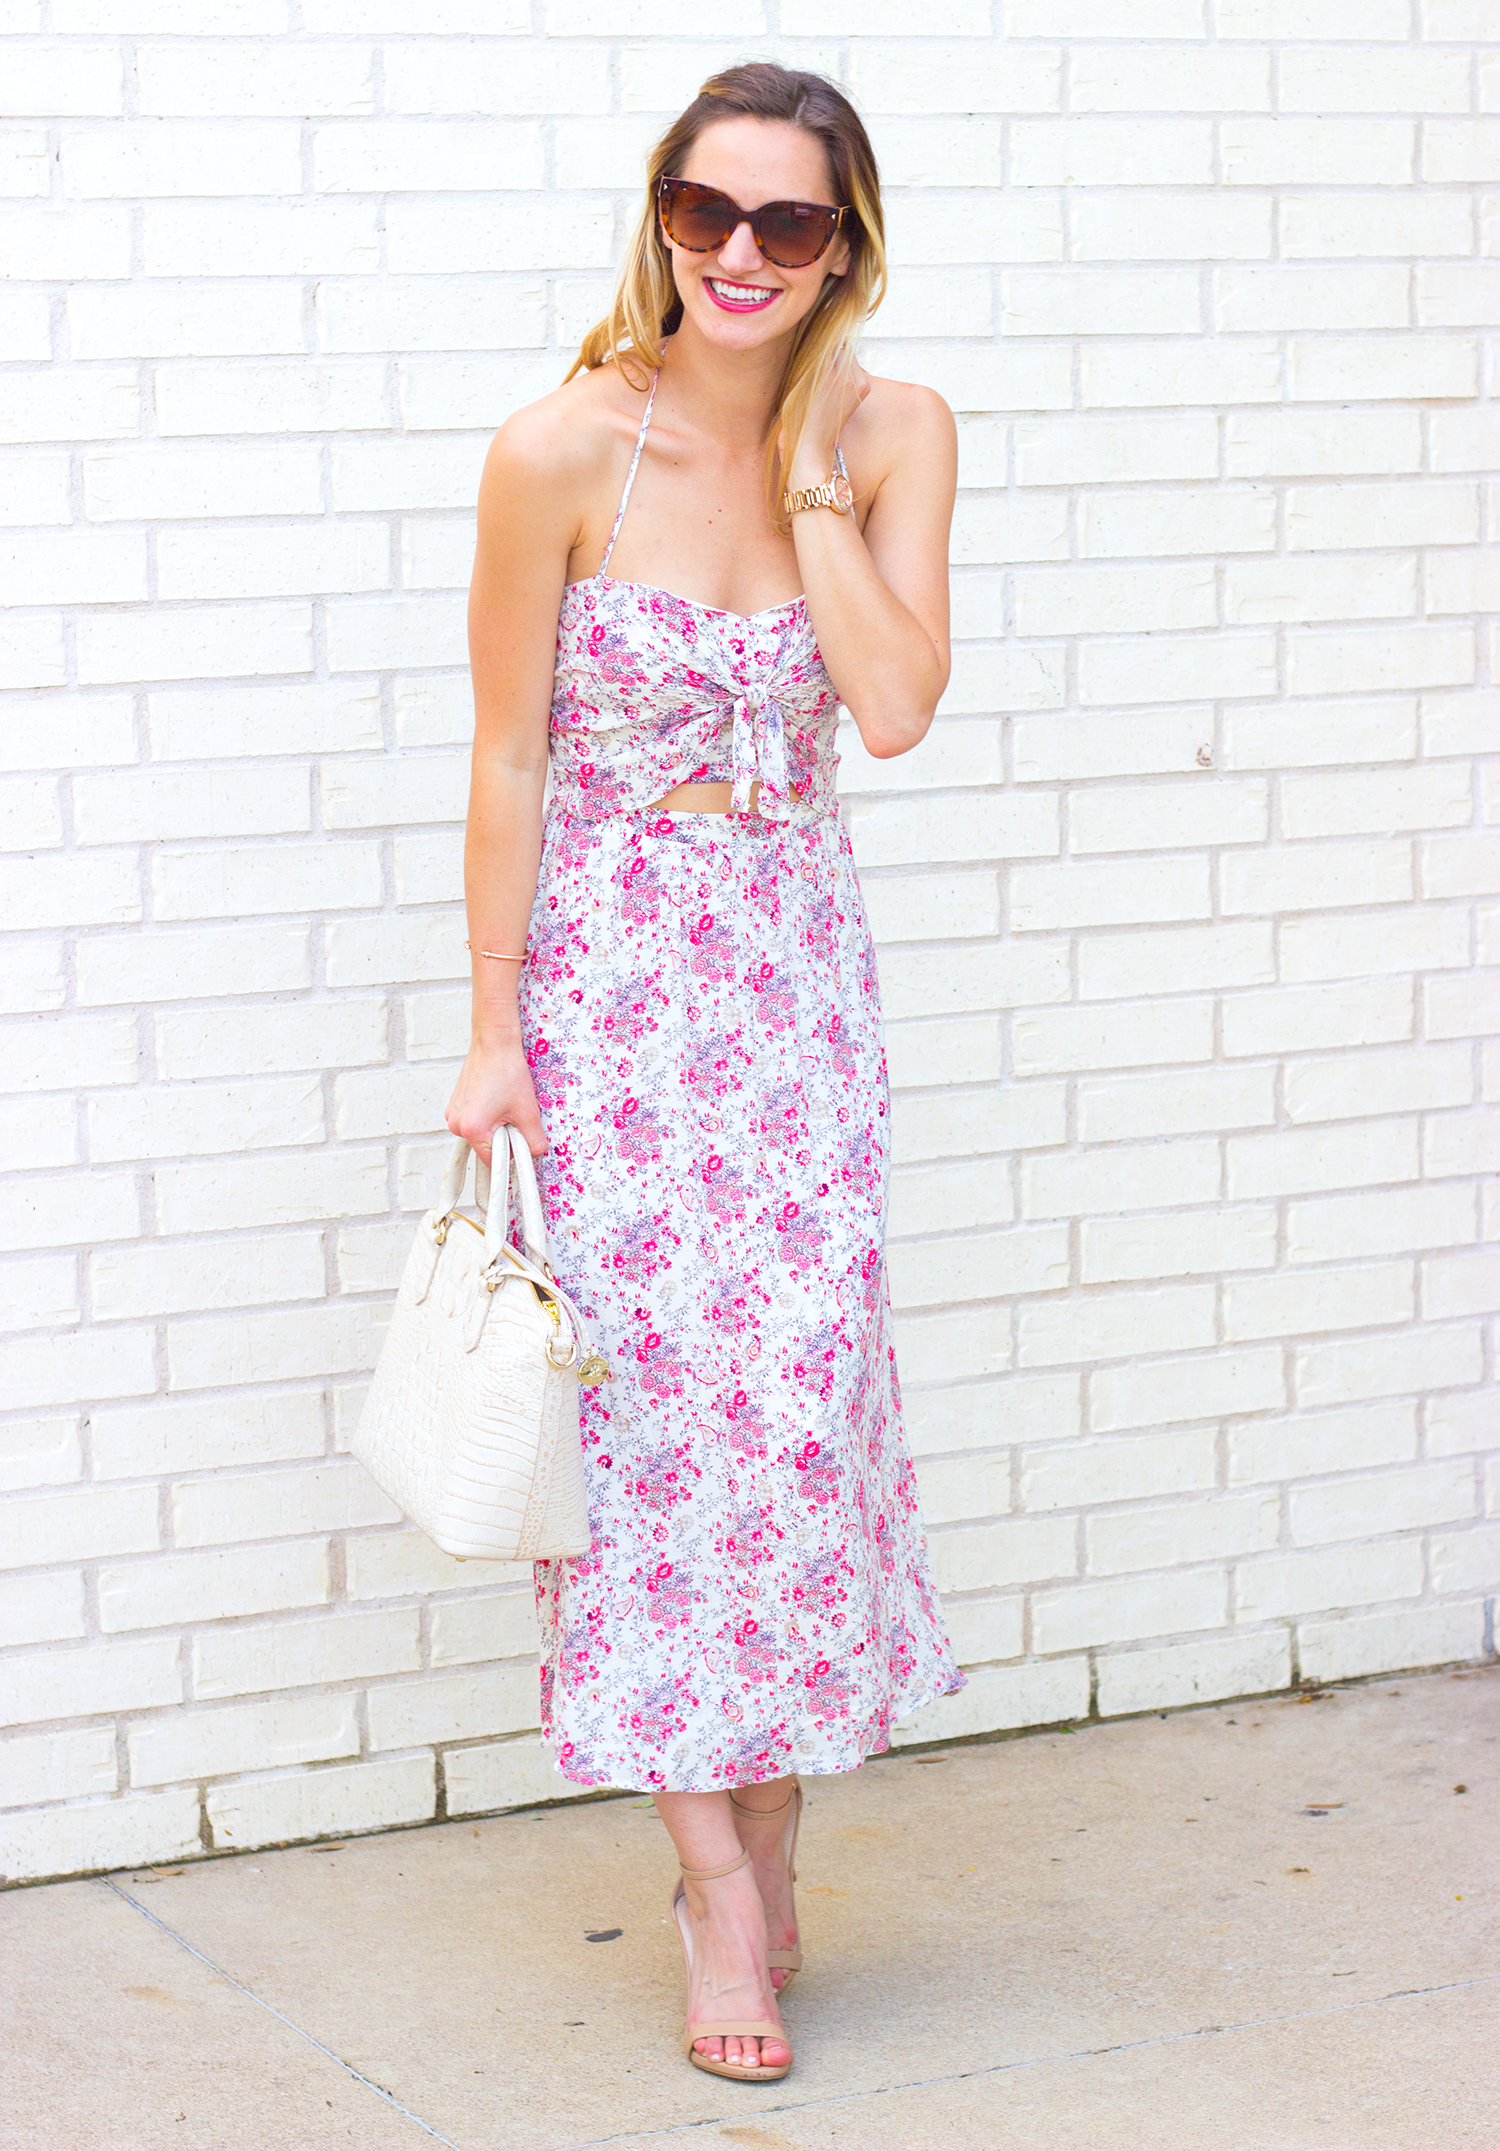 livvyland-blog-olivia-watson-austin-texas-fashion-blogger-astr-pink-floral-cutout-halter-sweetheart-maxi-dress-brahmin-duxbury-handbag-cava-5